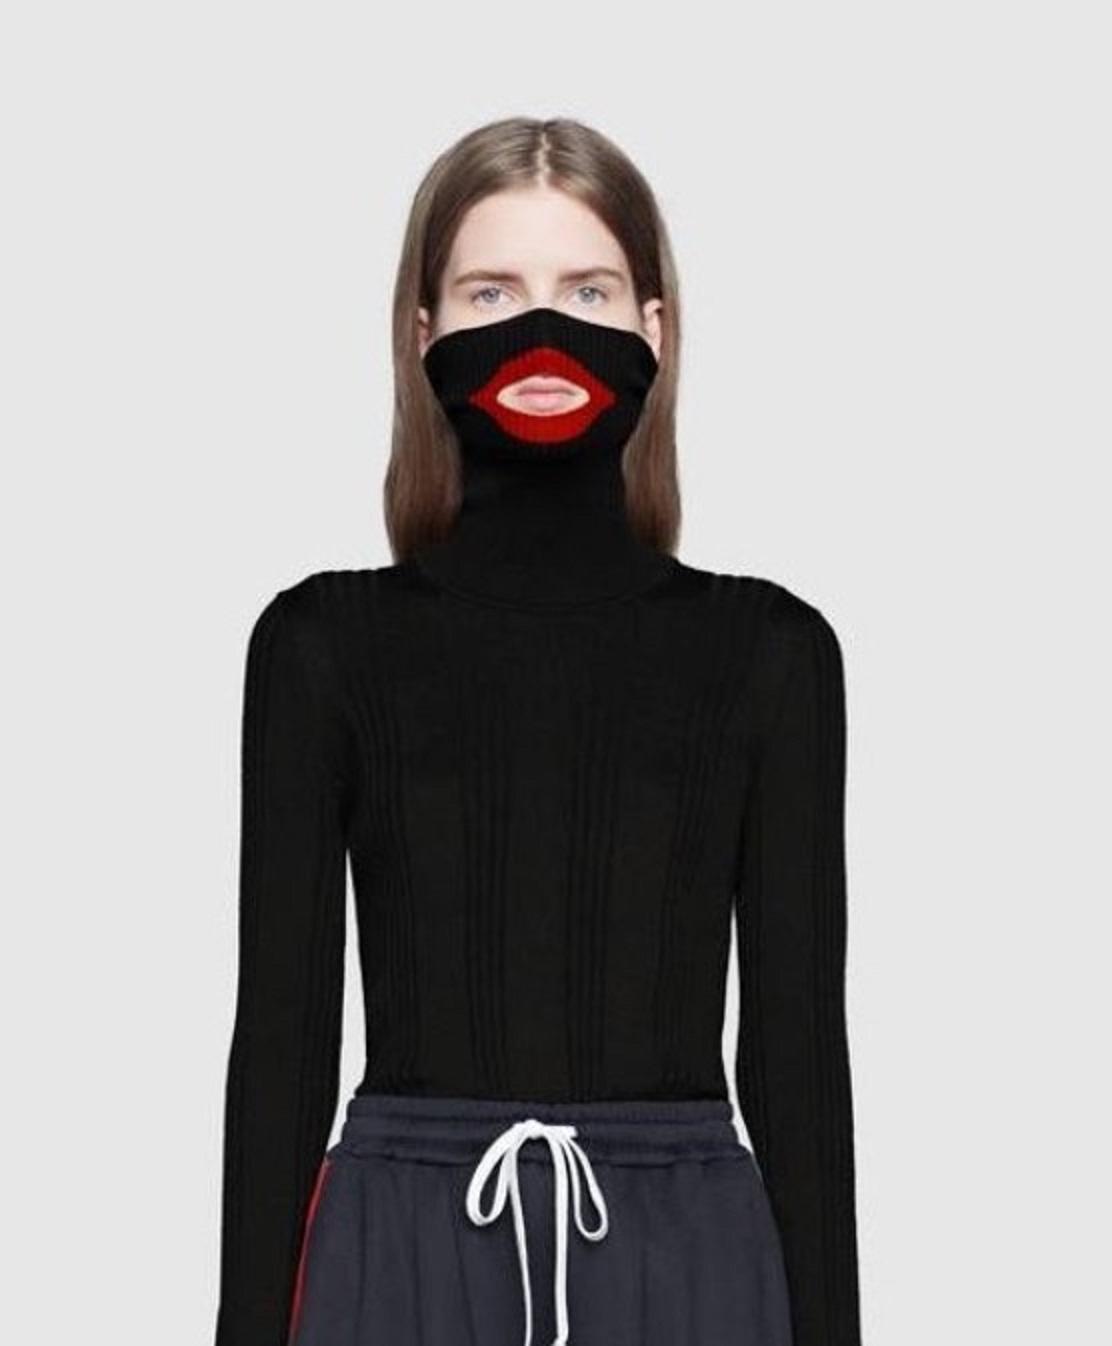 check out 60e7a b0c1f グッチの「人種差別的」セーターに批判集中、謝罪→販売中止へ ...